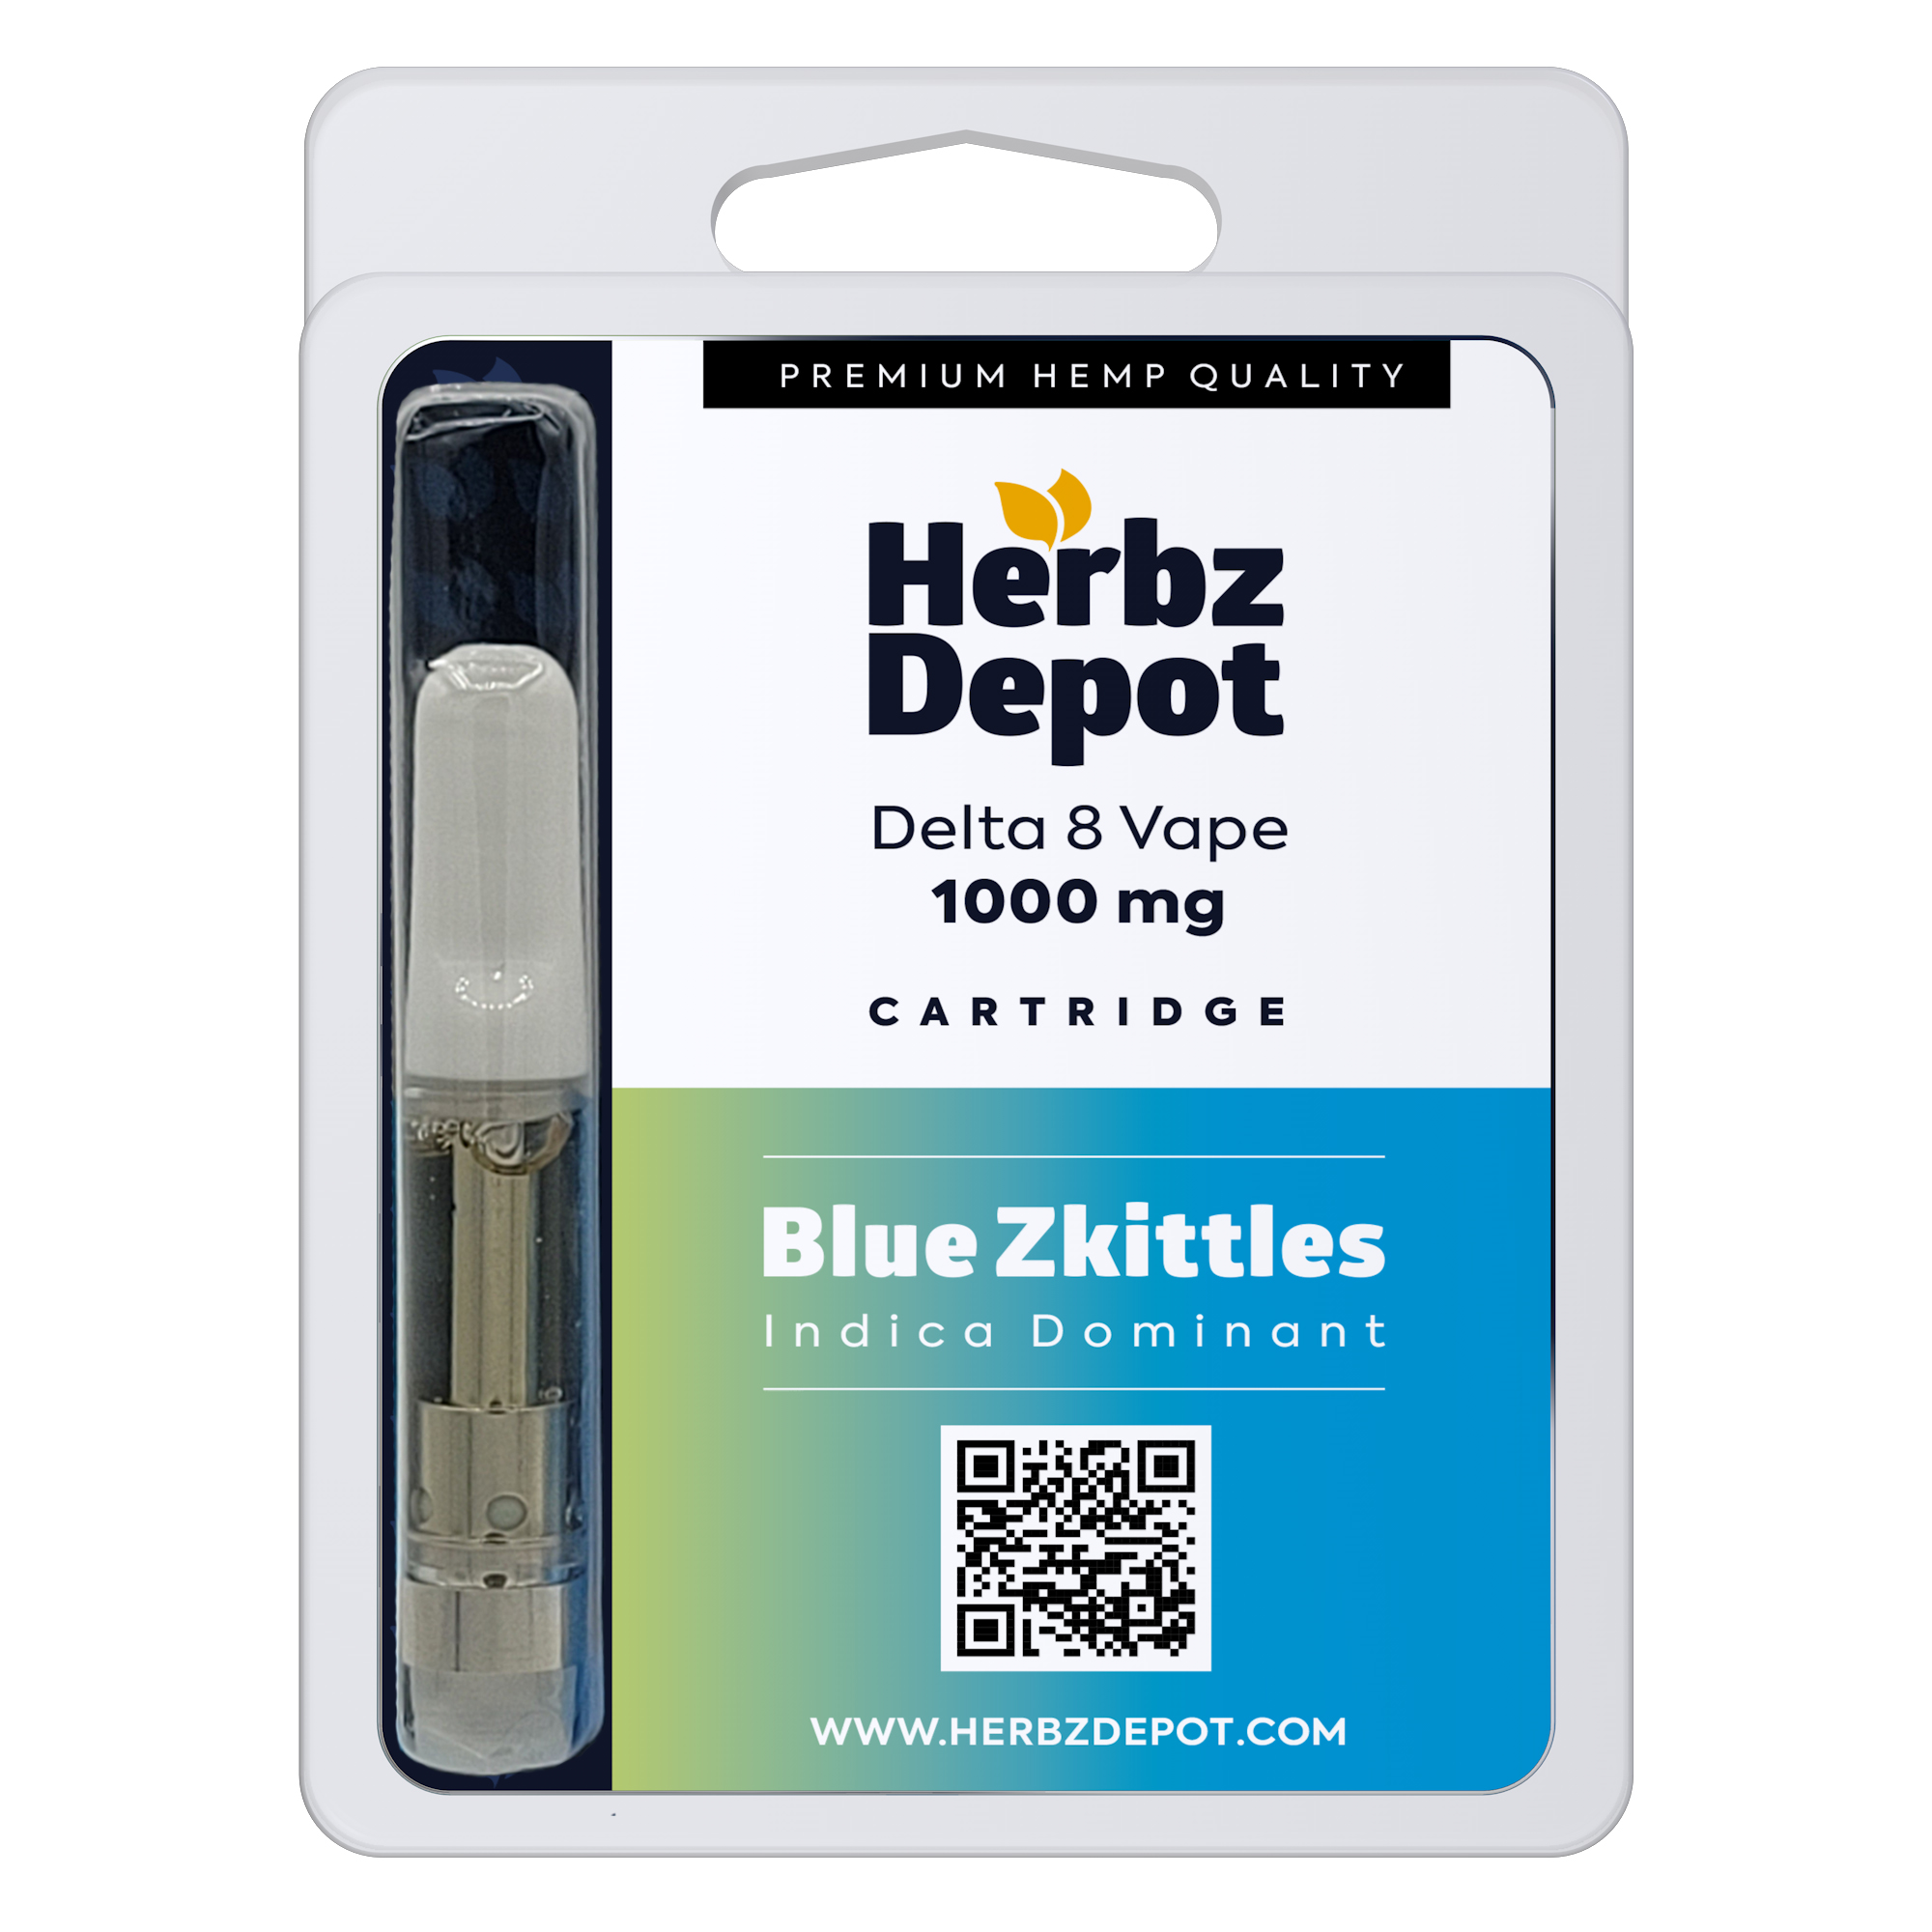 Blue Zkittles